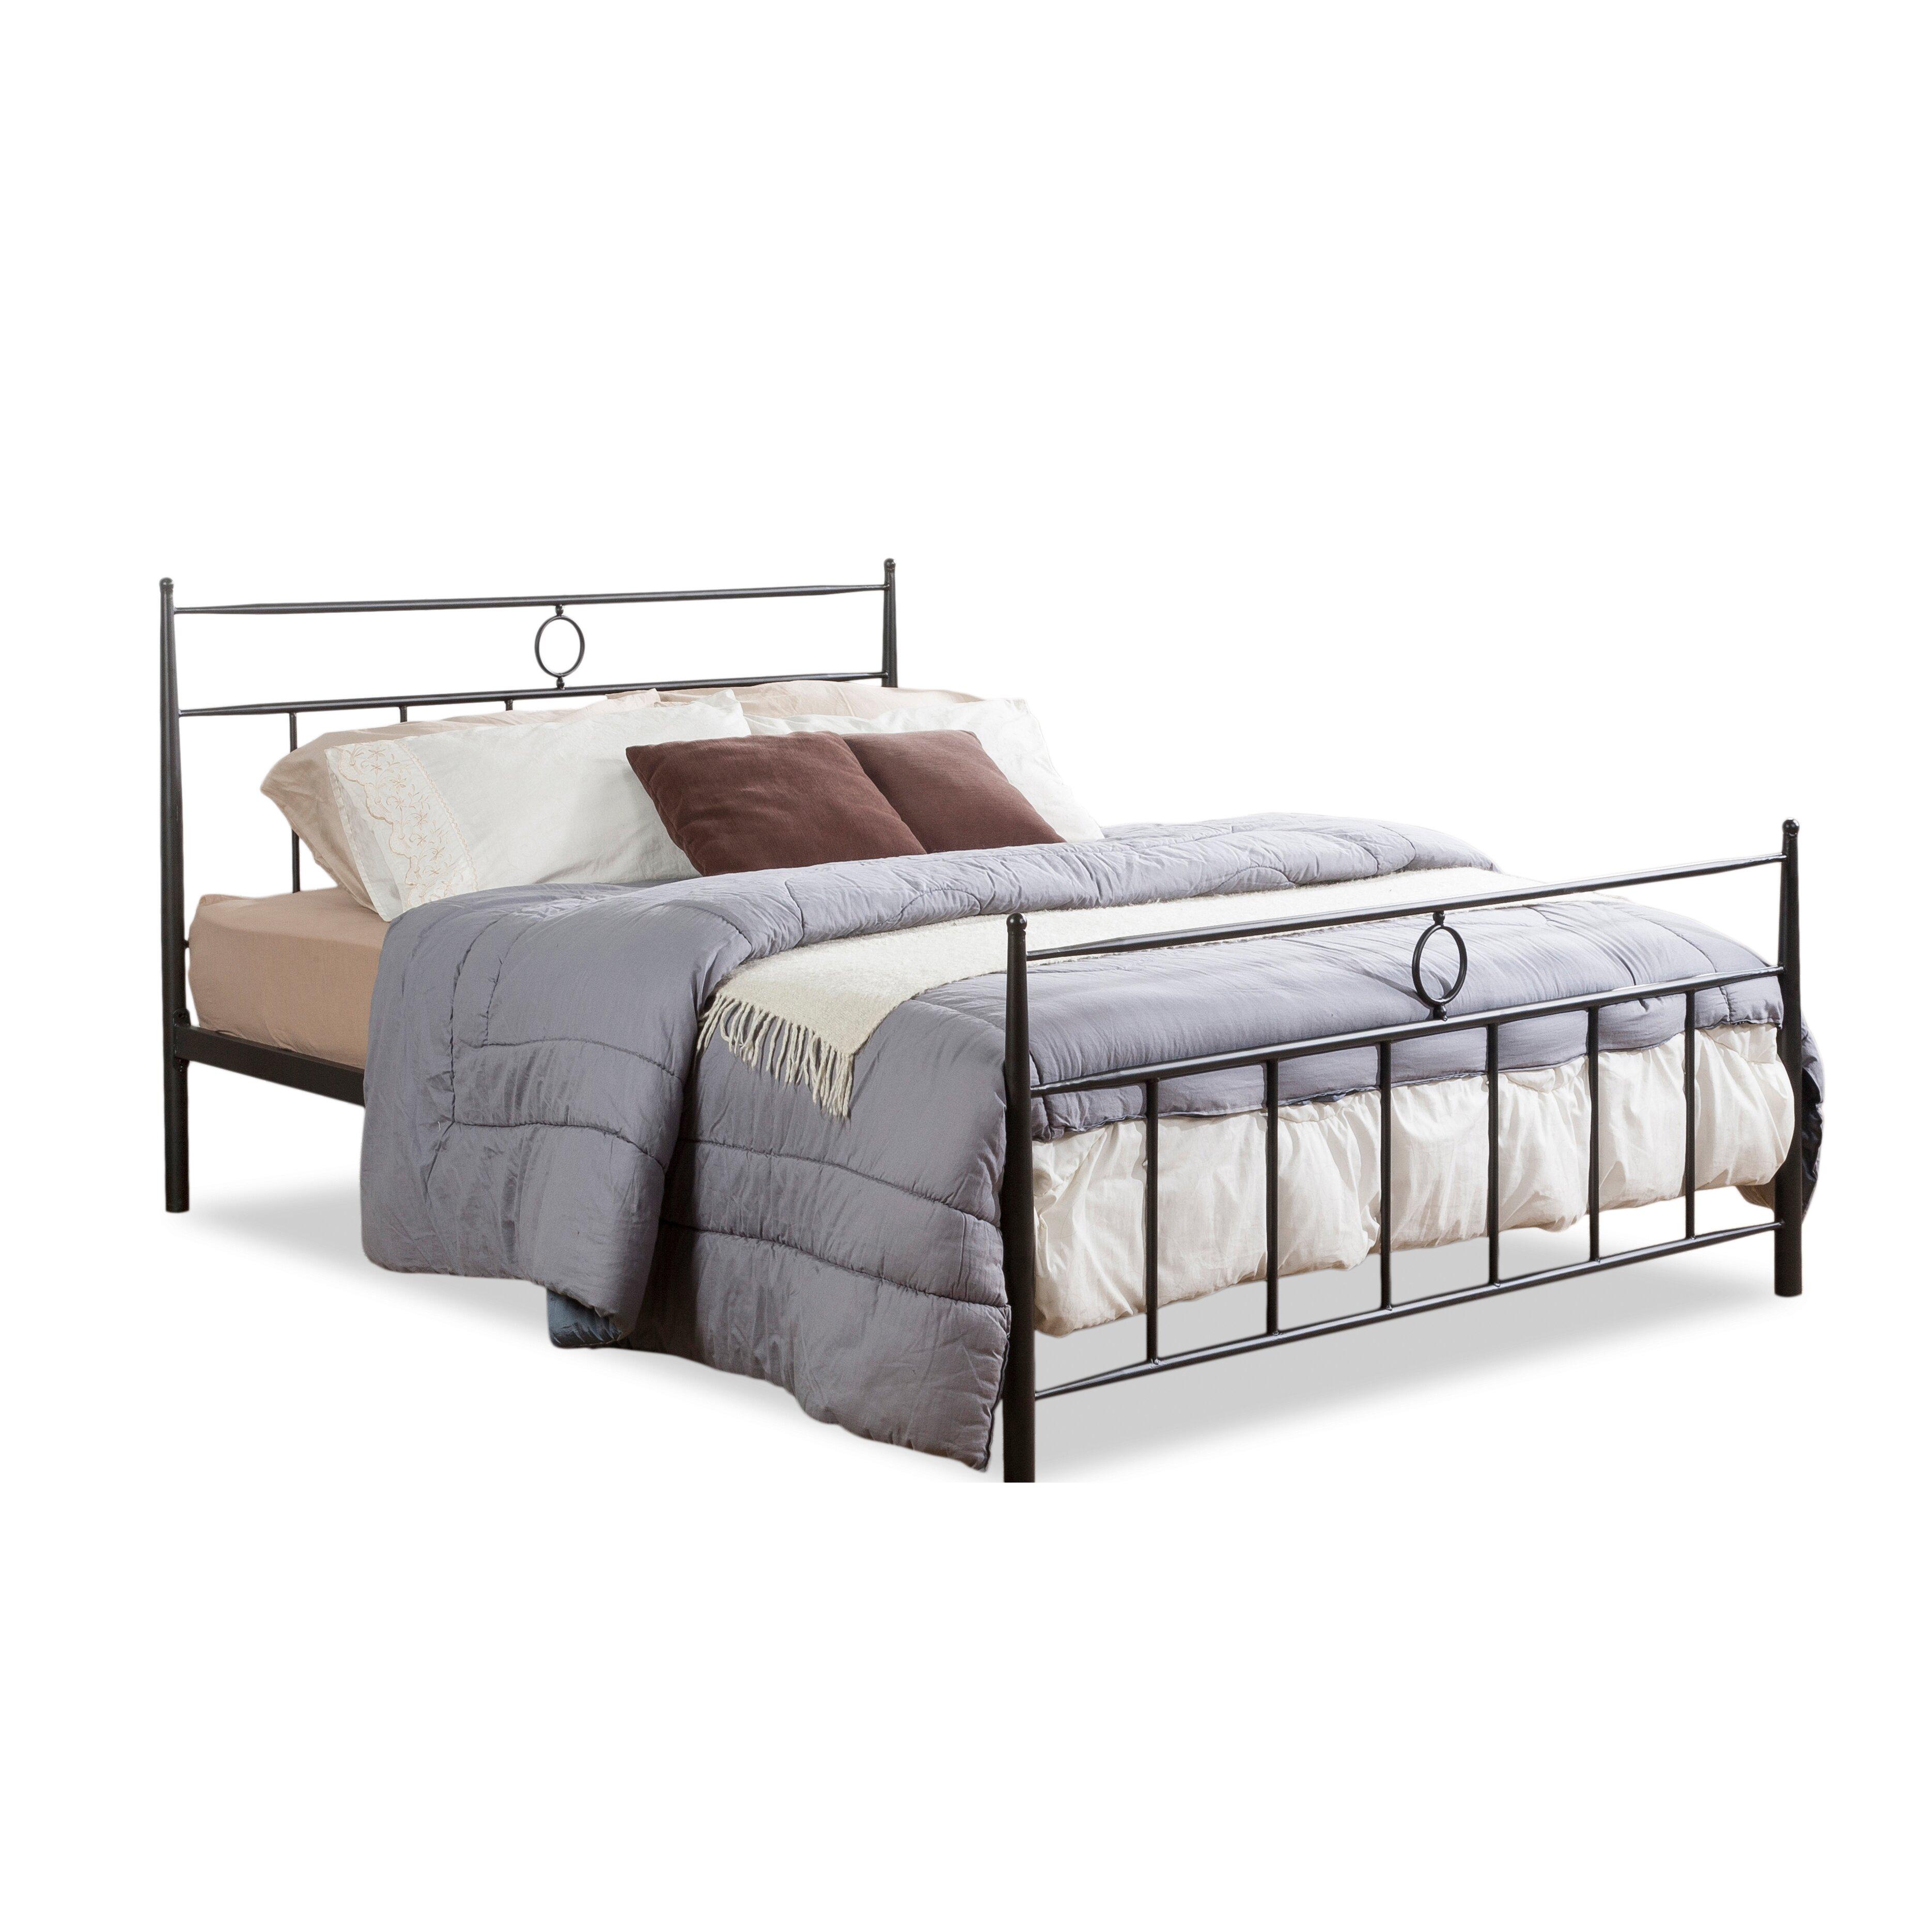 Wholesale Interiors Baxton Studio Platform Bed Amp Reviews